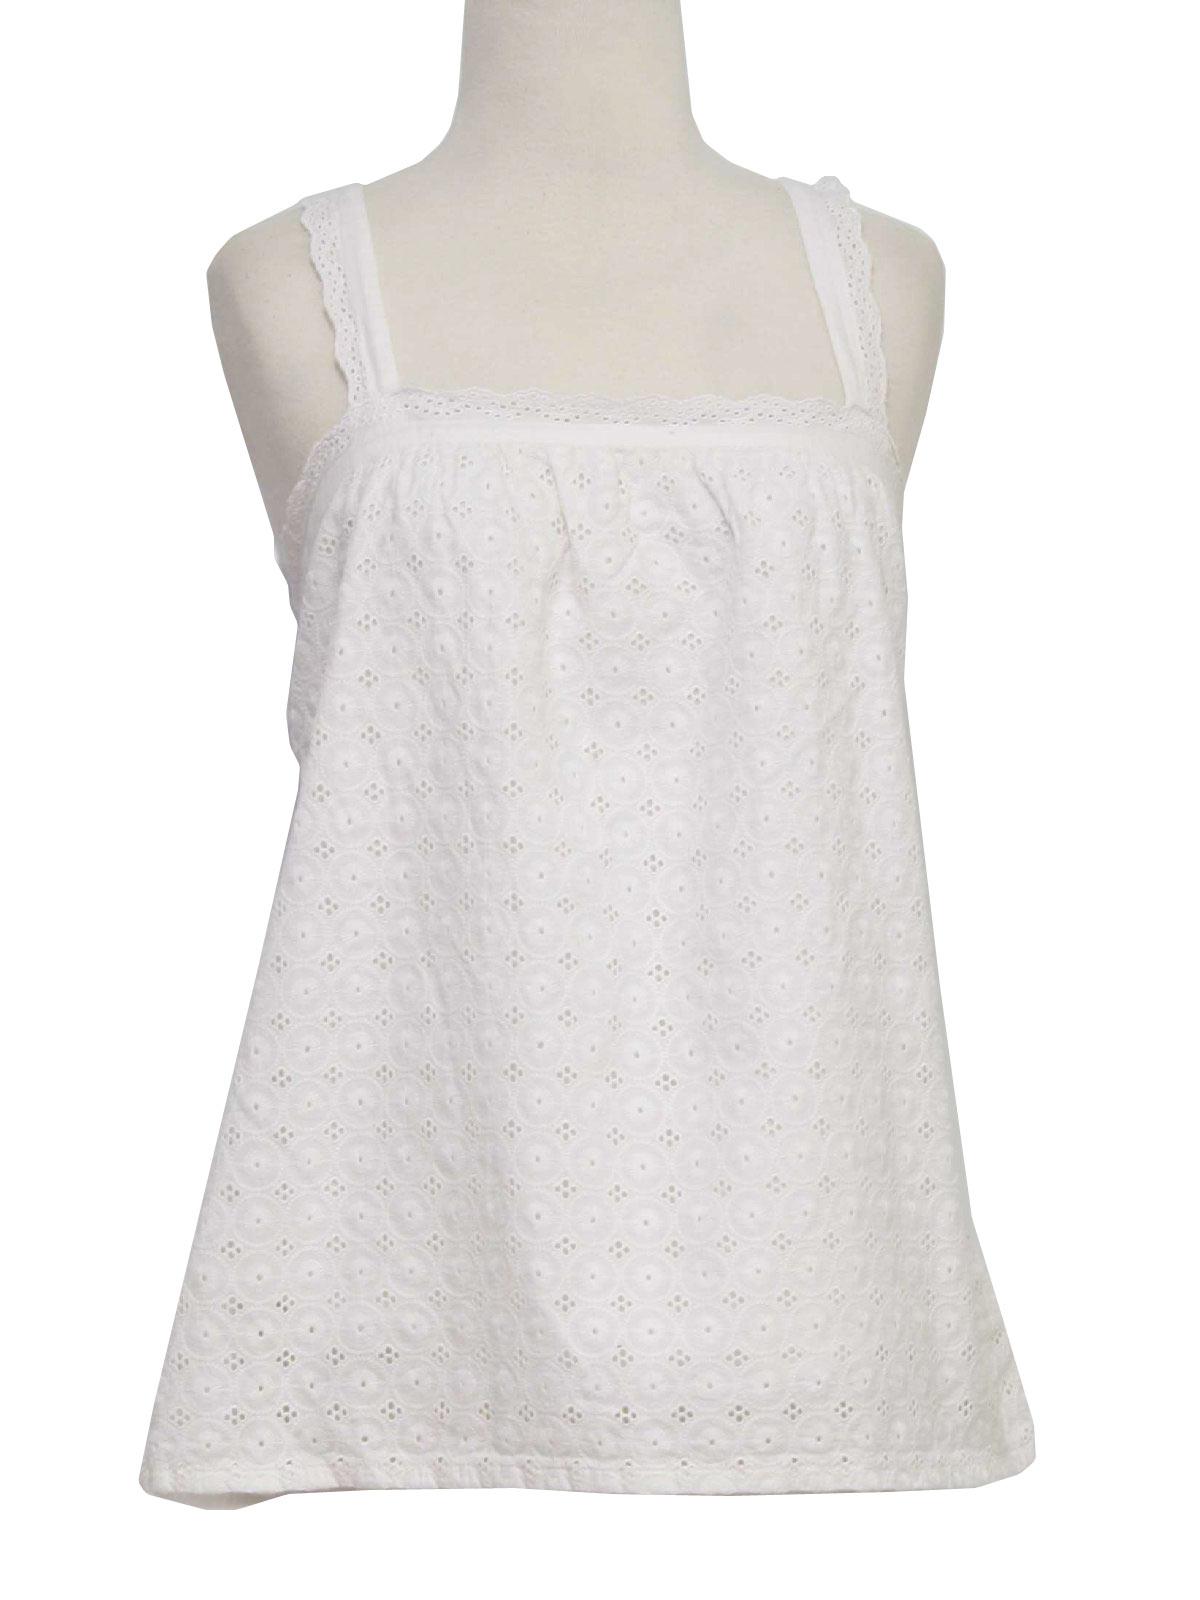 f53113c70629e Retro 1960 s Hippie Shirt (1969 Gap Jeans)   60s style (made ...